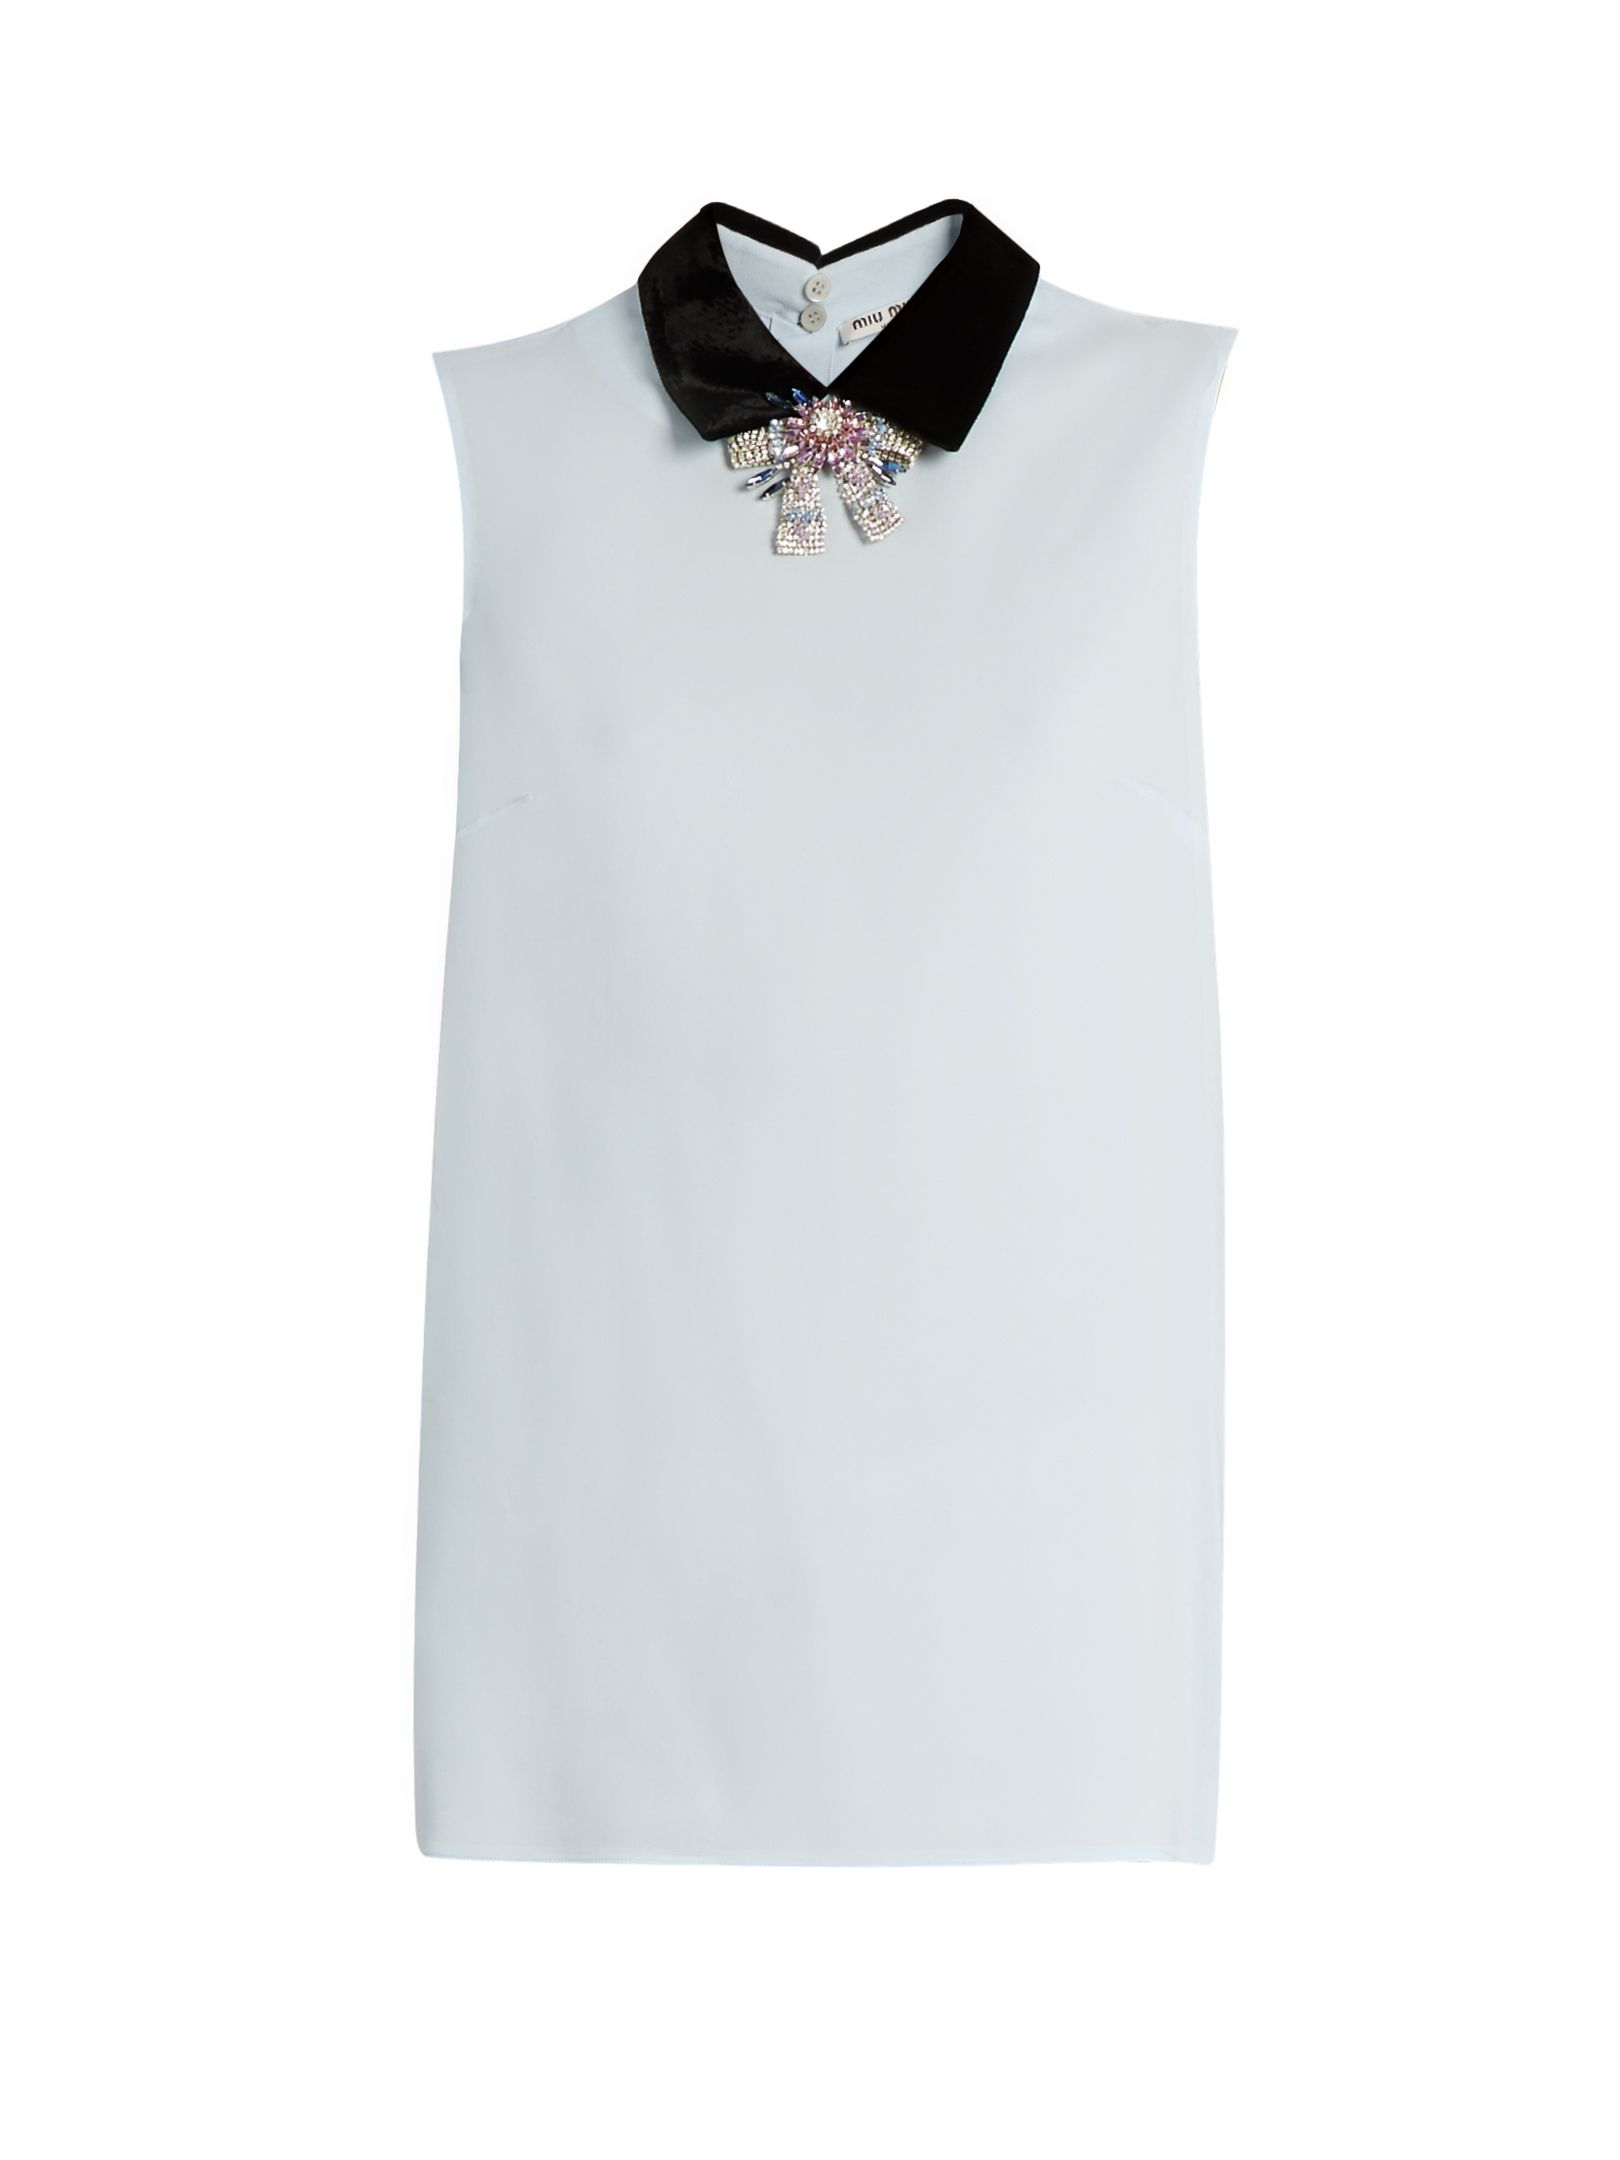 Discount Deals Looking For Online crystal embellished blouse - Pink & Purple Miu Miu QzaEuEP